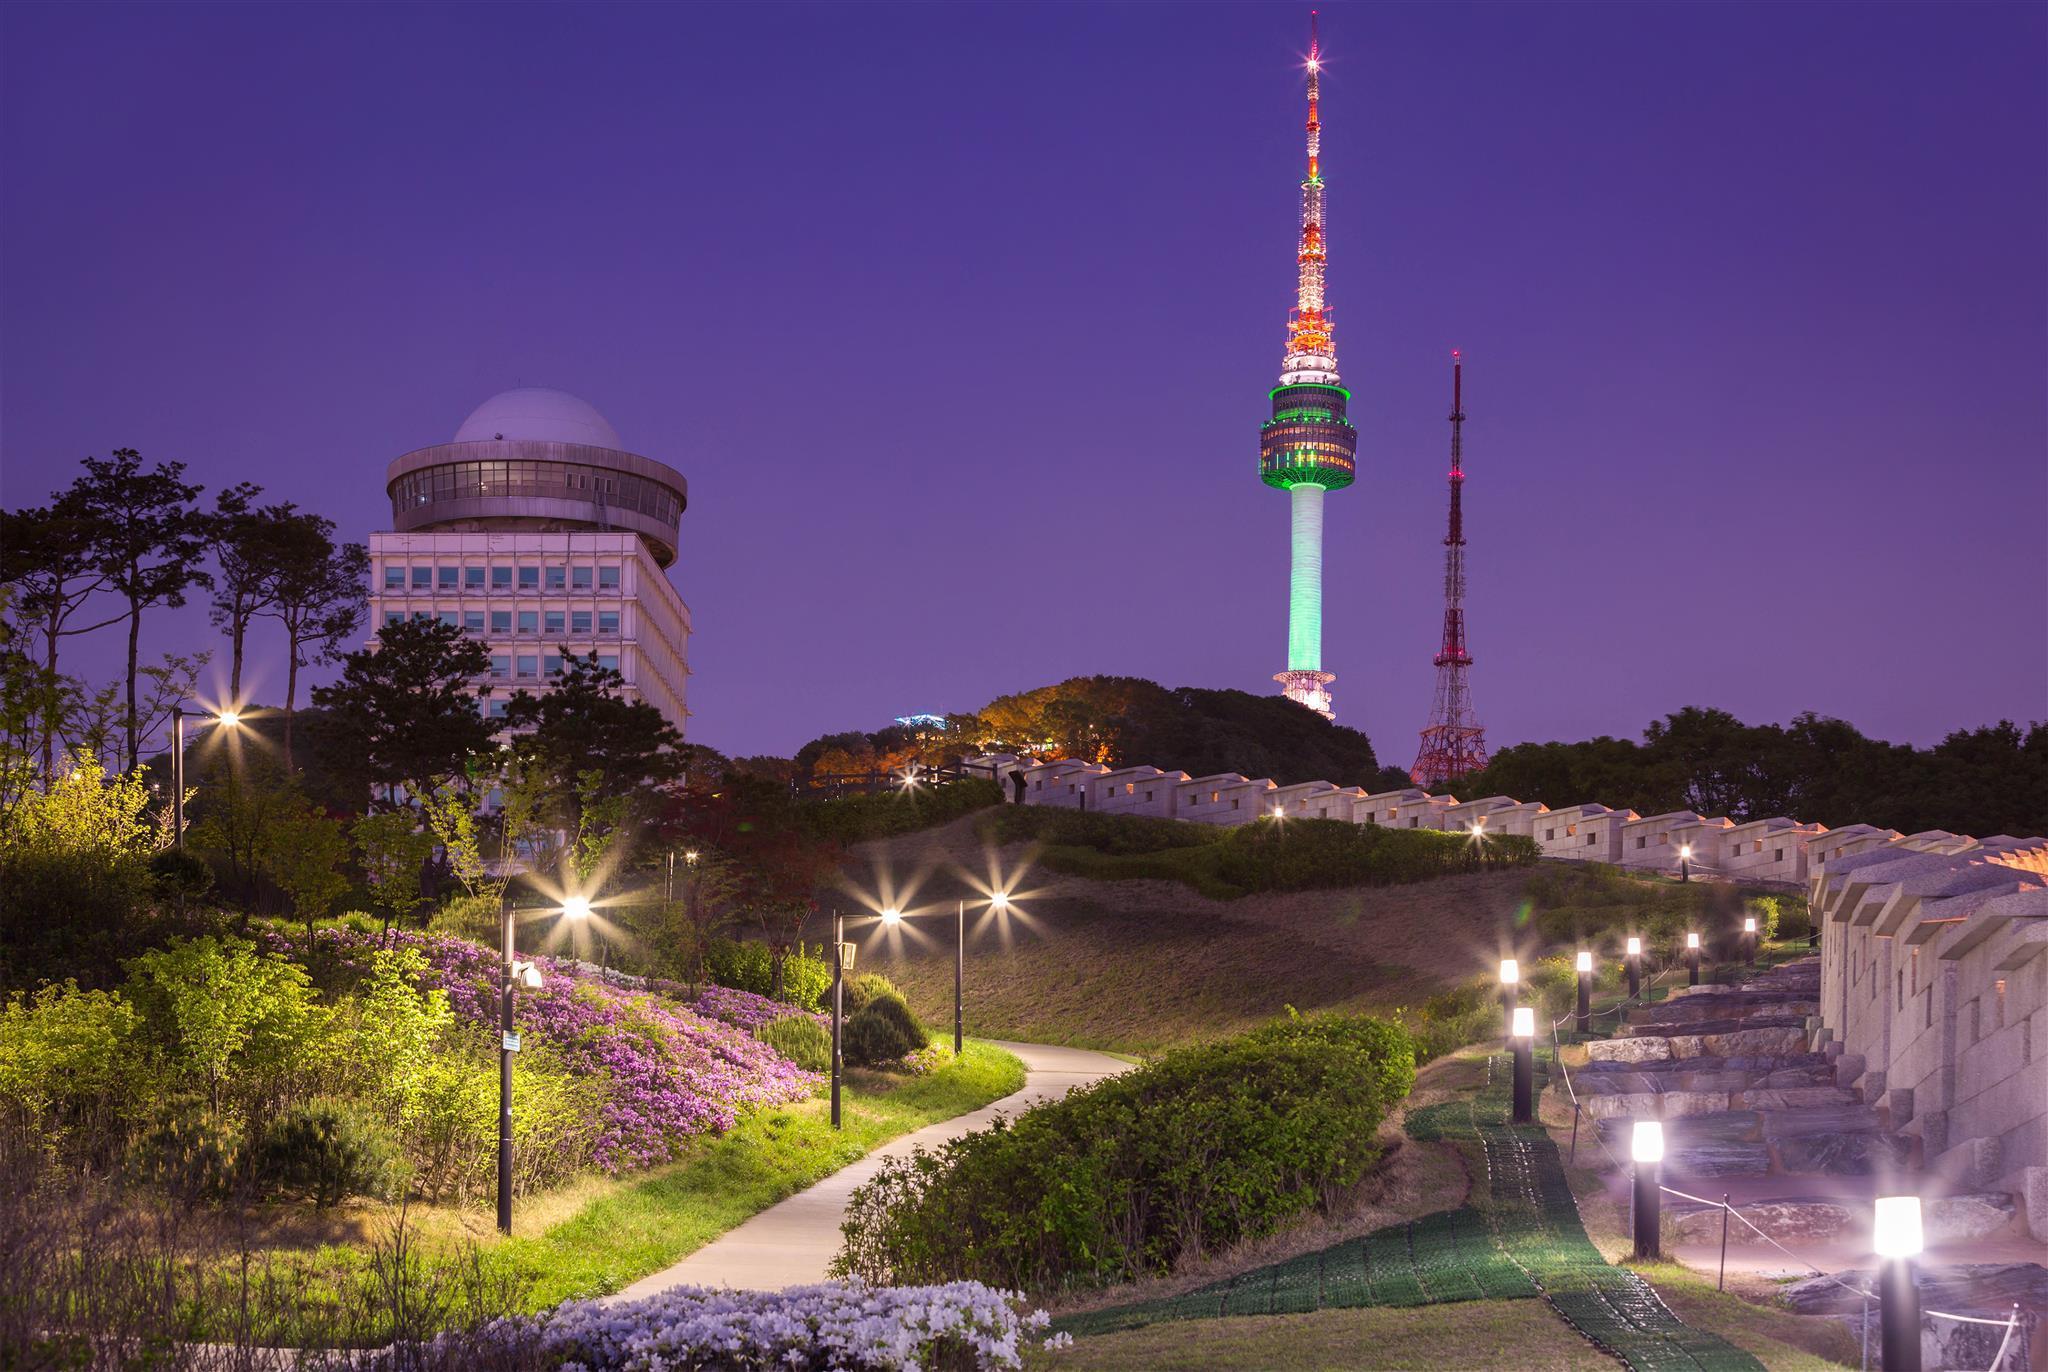 Hotel 2U, Seongbuk